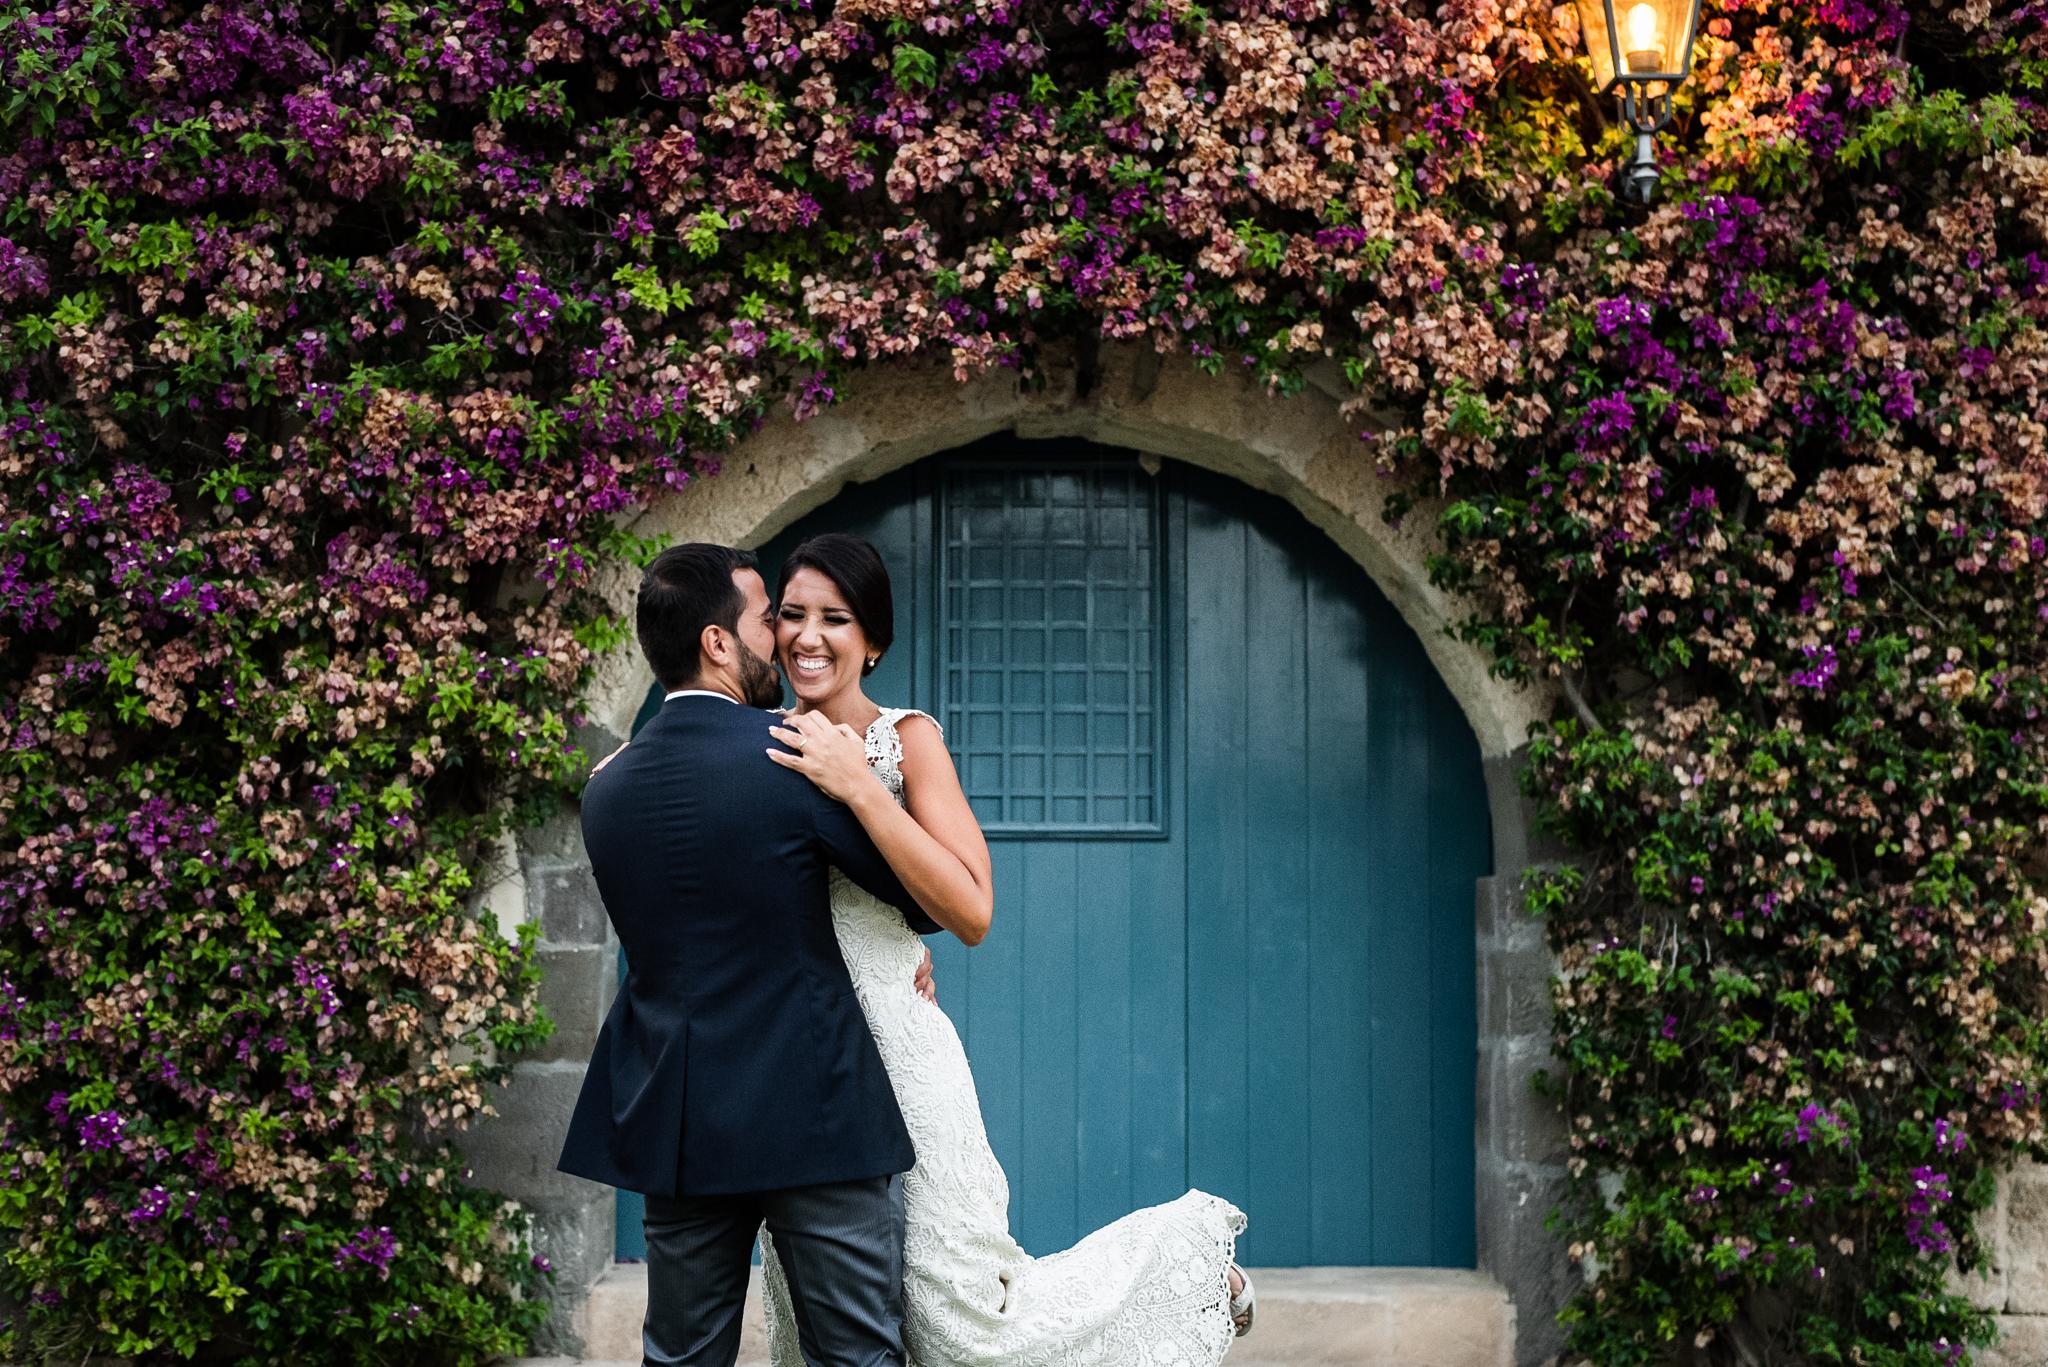 Best-wedding-photographer-in-Sicily- Catania-30.jpg